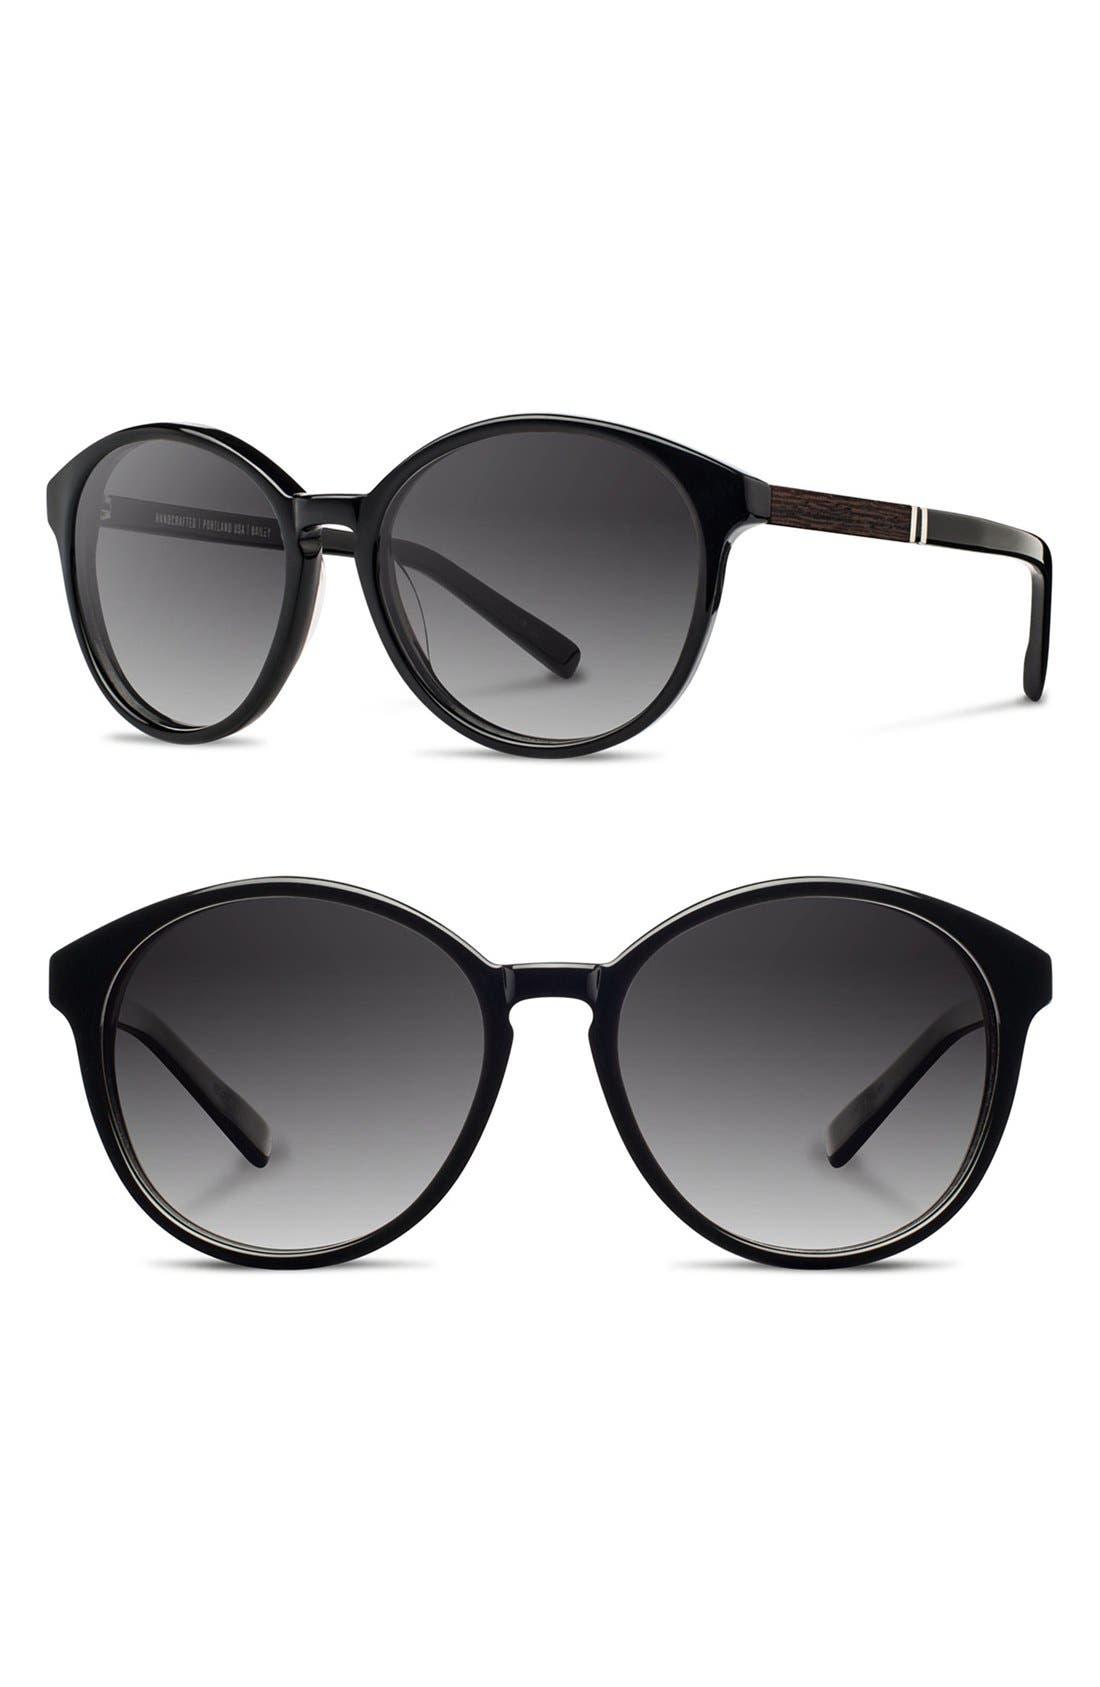 SHWOOD 'Bailey' 53Mm Polarized Sunglasses - Black/ Ebony/ Grey Fade Polar